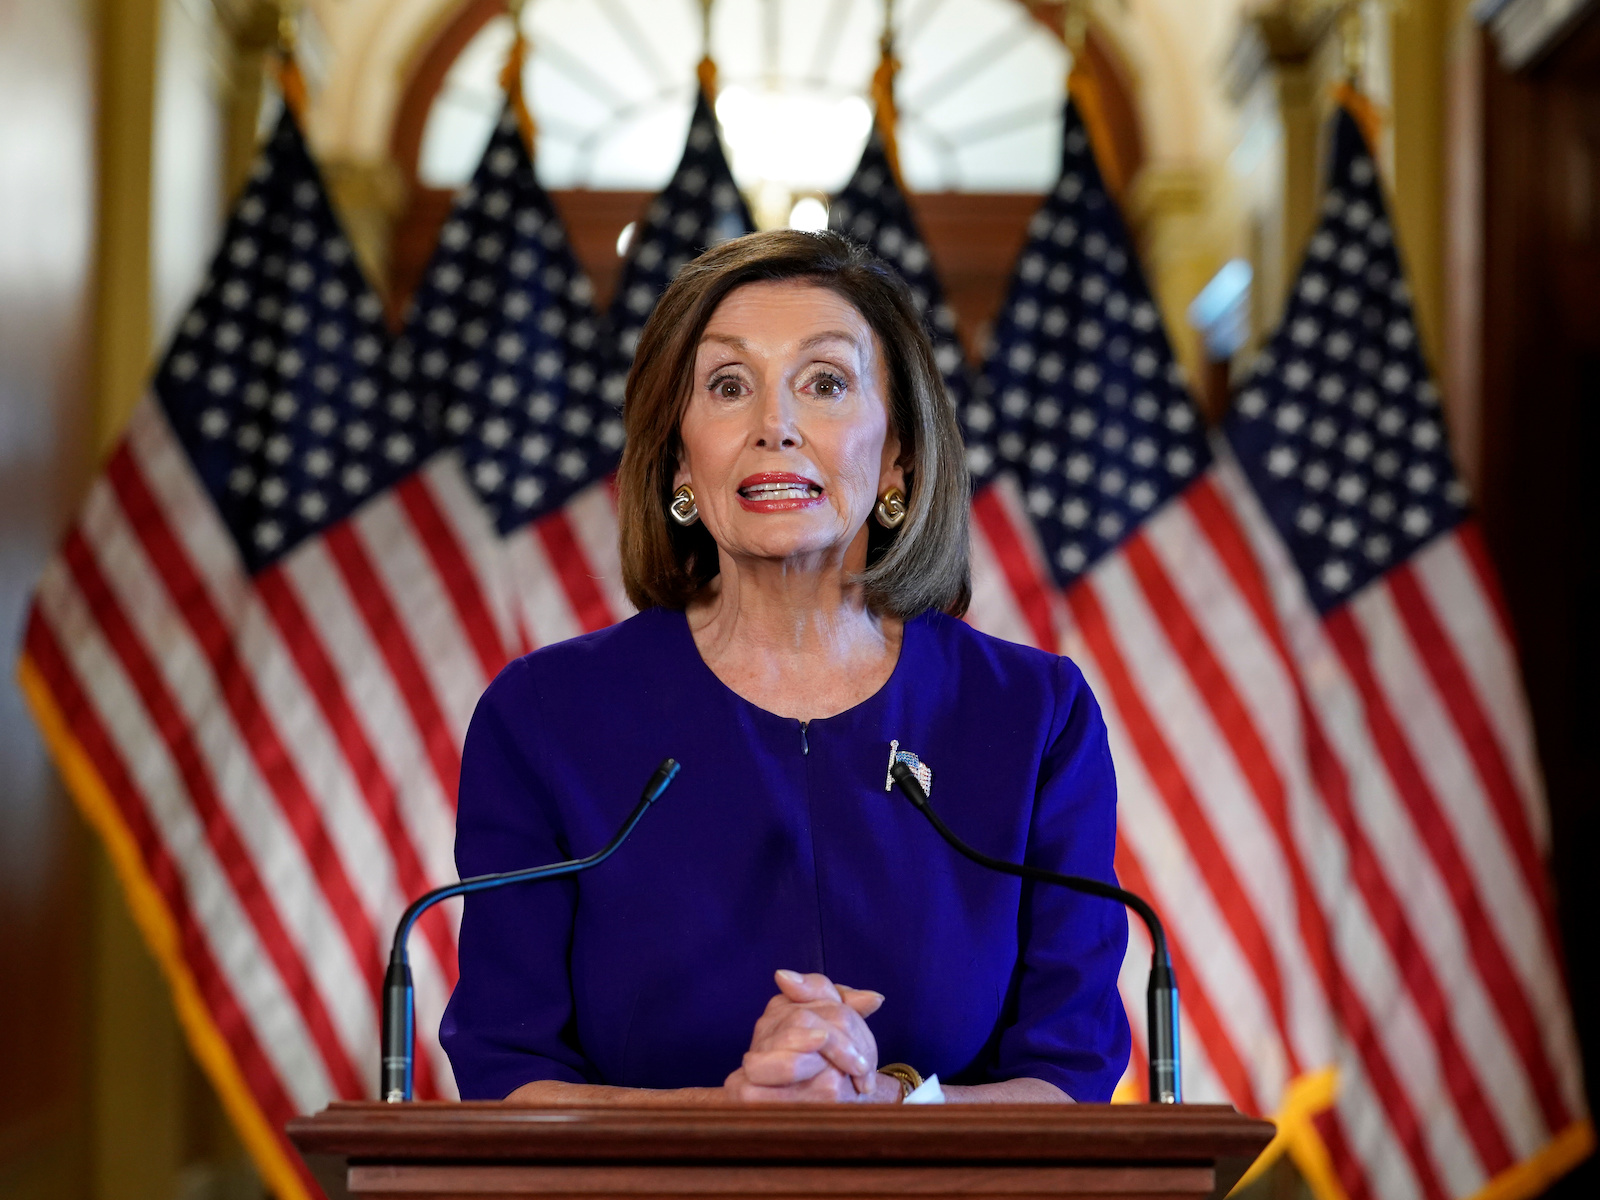 House Speaker Nancy Pelosi announces Trump impeachment inquiry at the U.S. Capitol in Washington